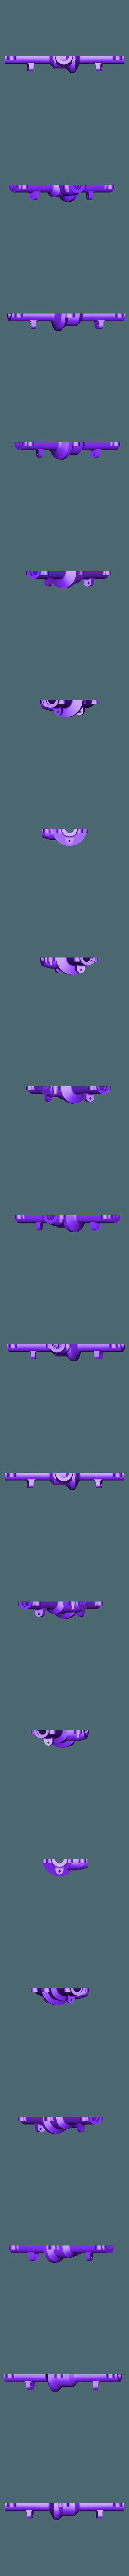 TruckV3_Axle2_rear_bottom_single.STL Download STL file 3D Printed RC Truck V3 • 3D print model, MrCrankyface